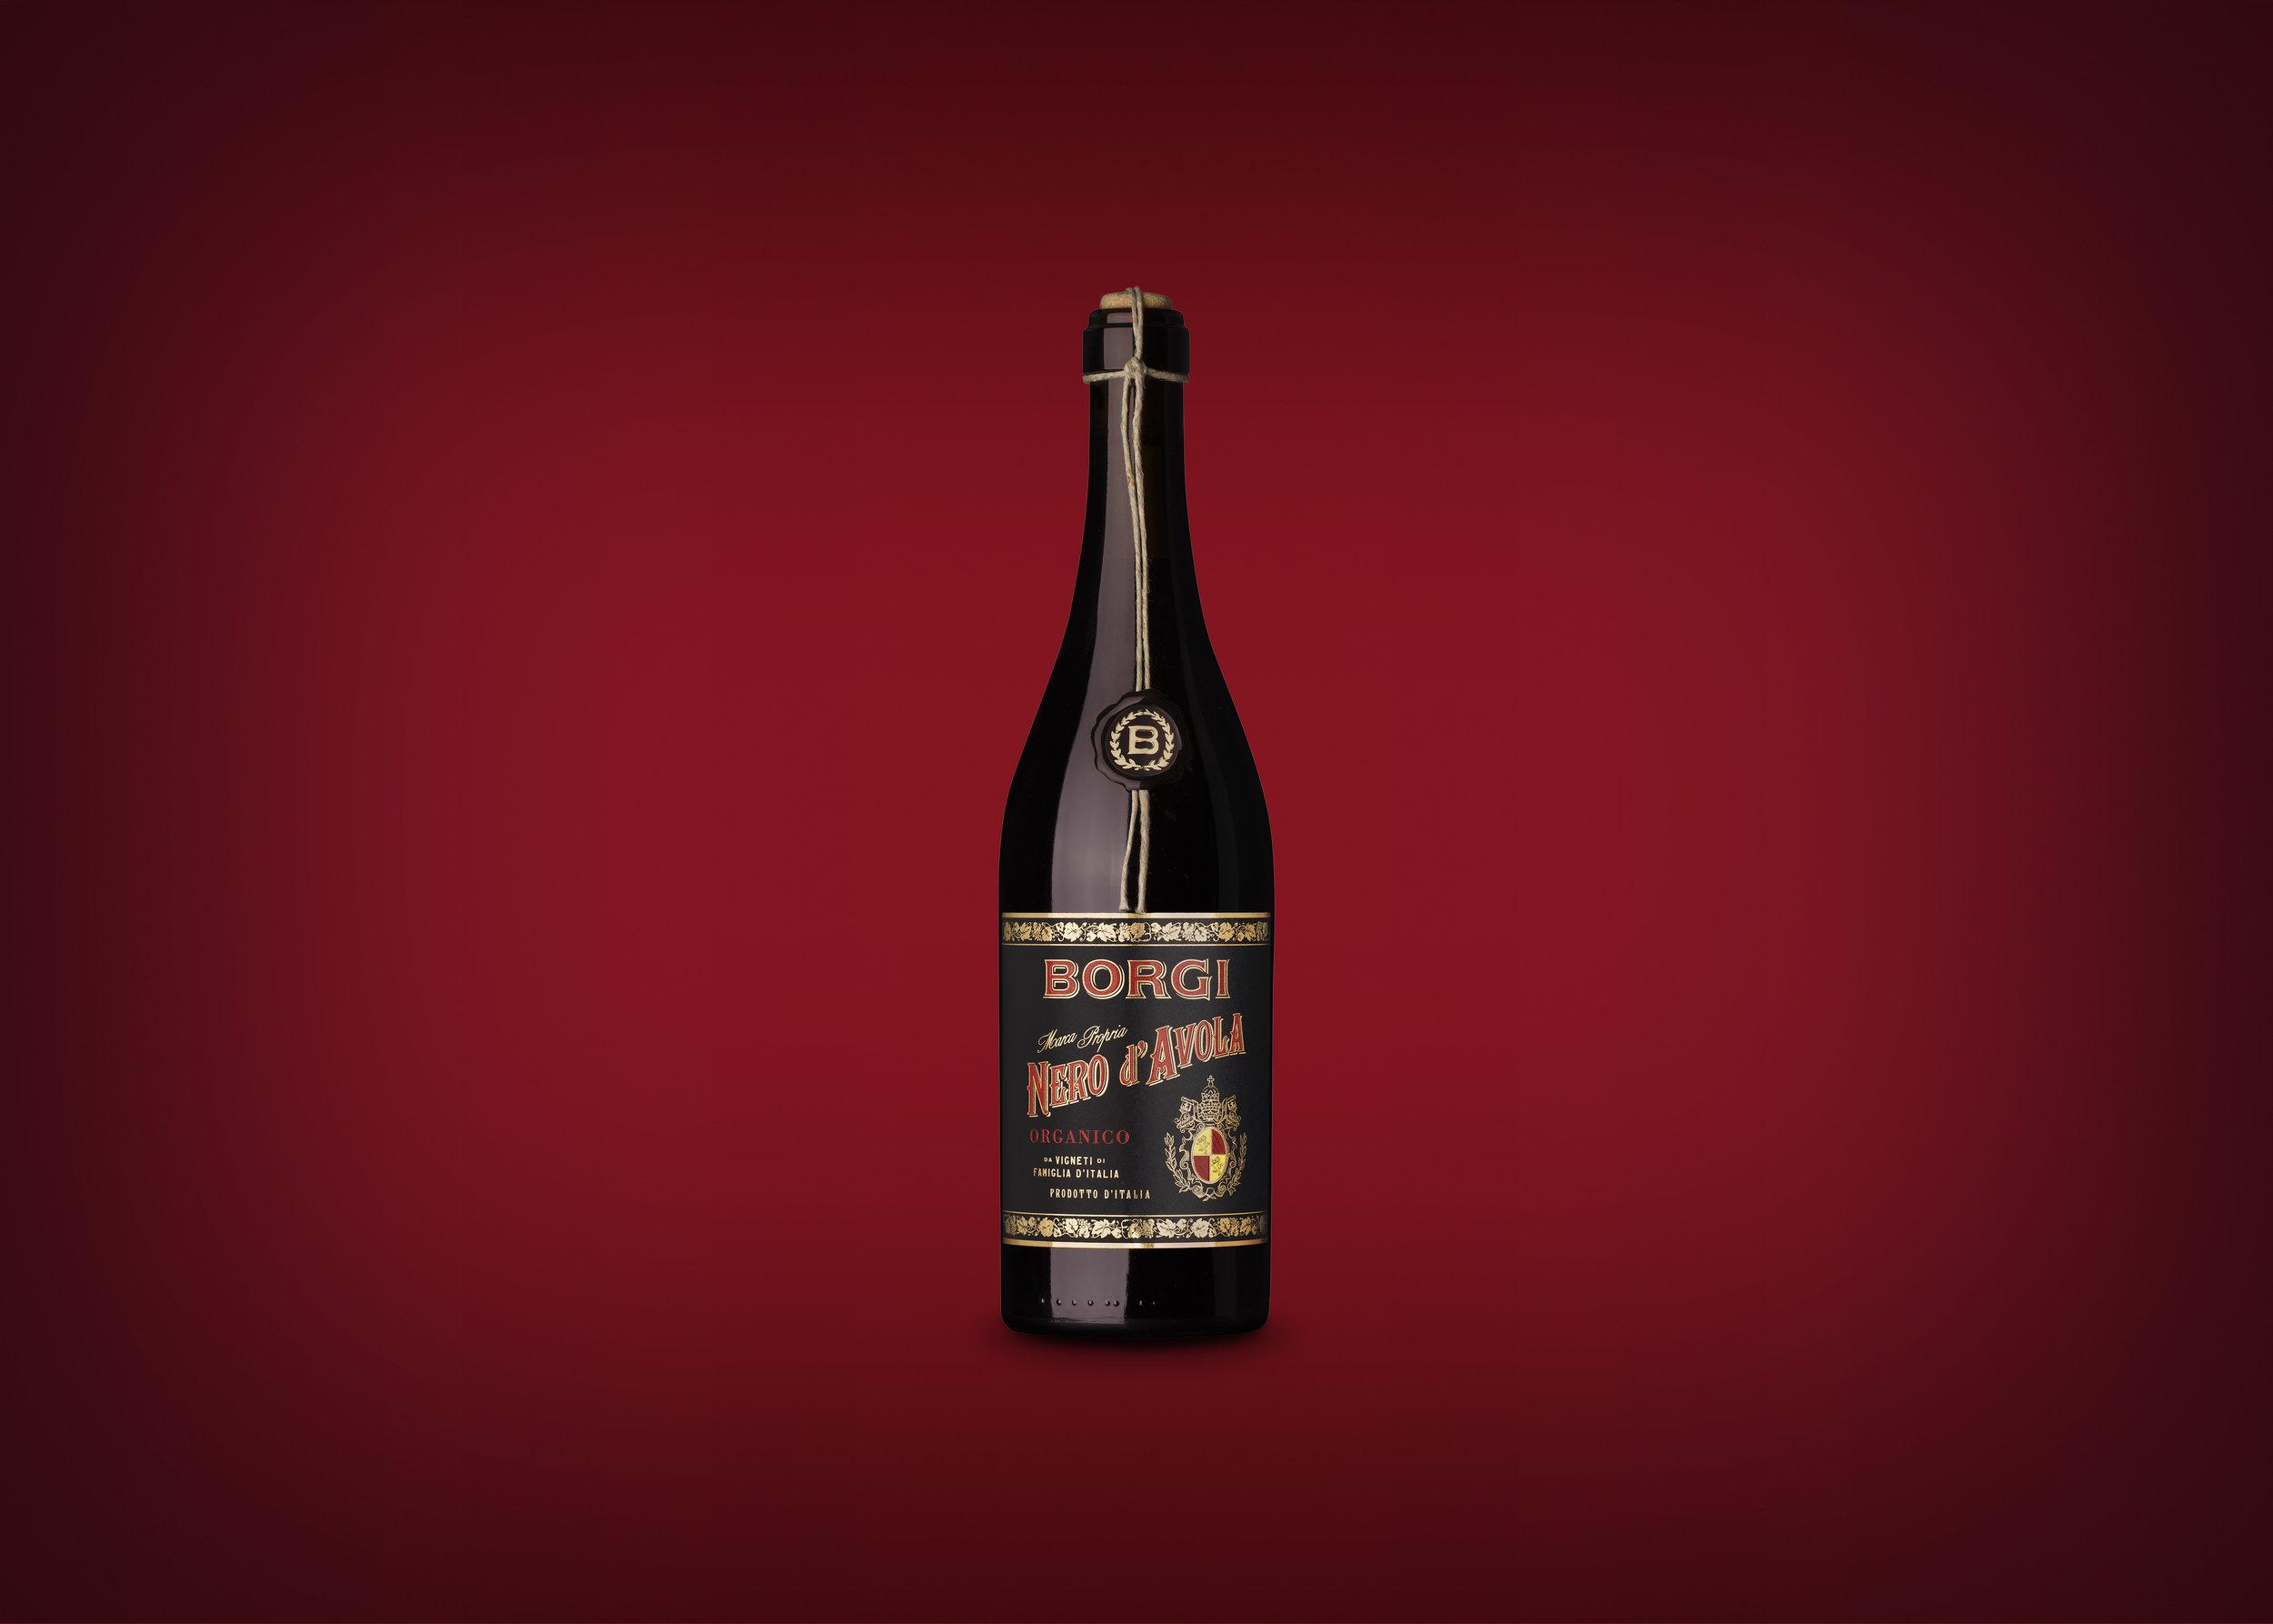 borgi bottle shot colour.jpg